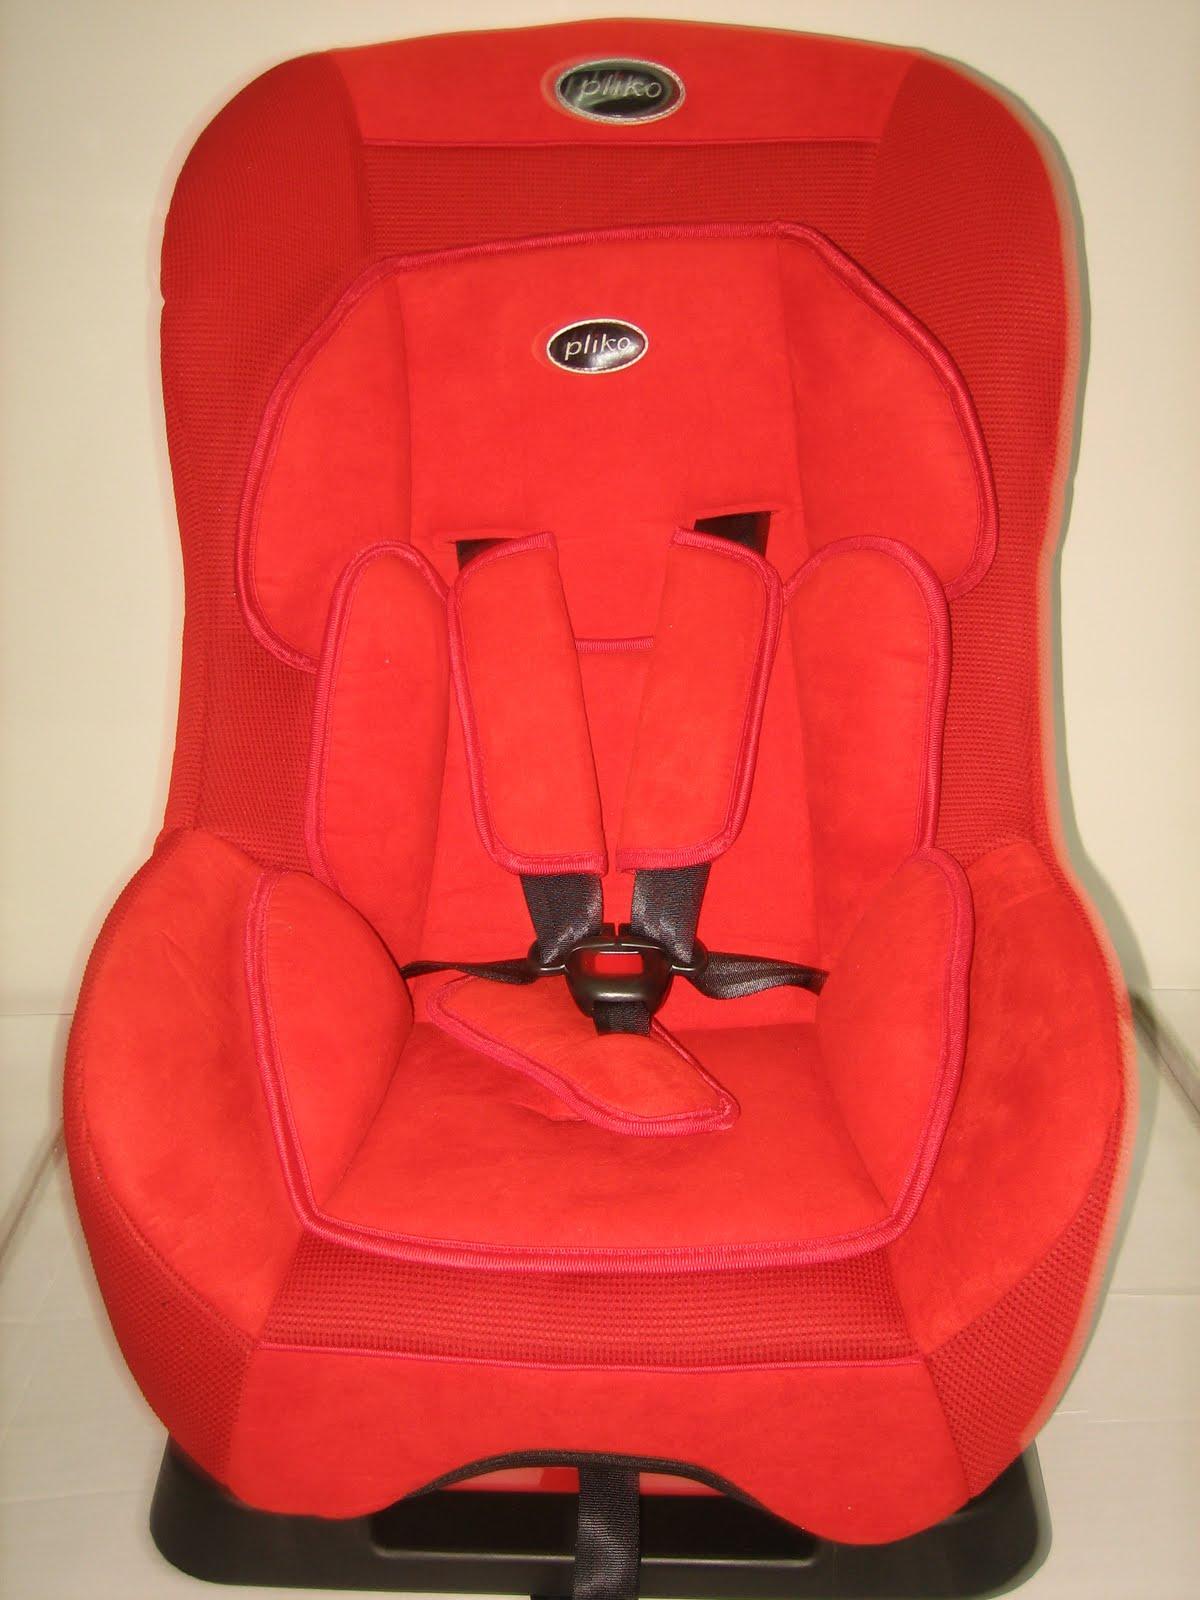 tokomagenta: A Showcase of Products: Baby Car Seat PLIKO ...